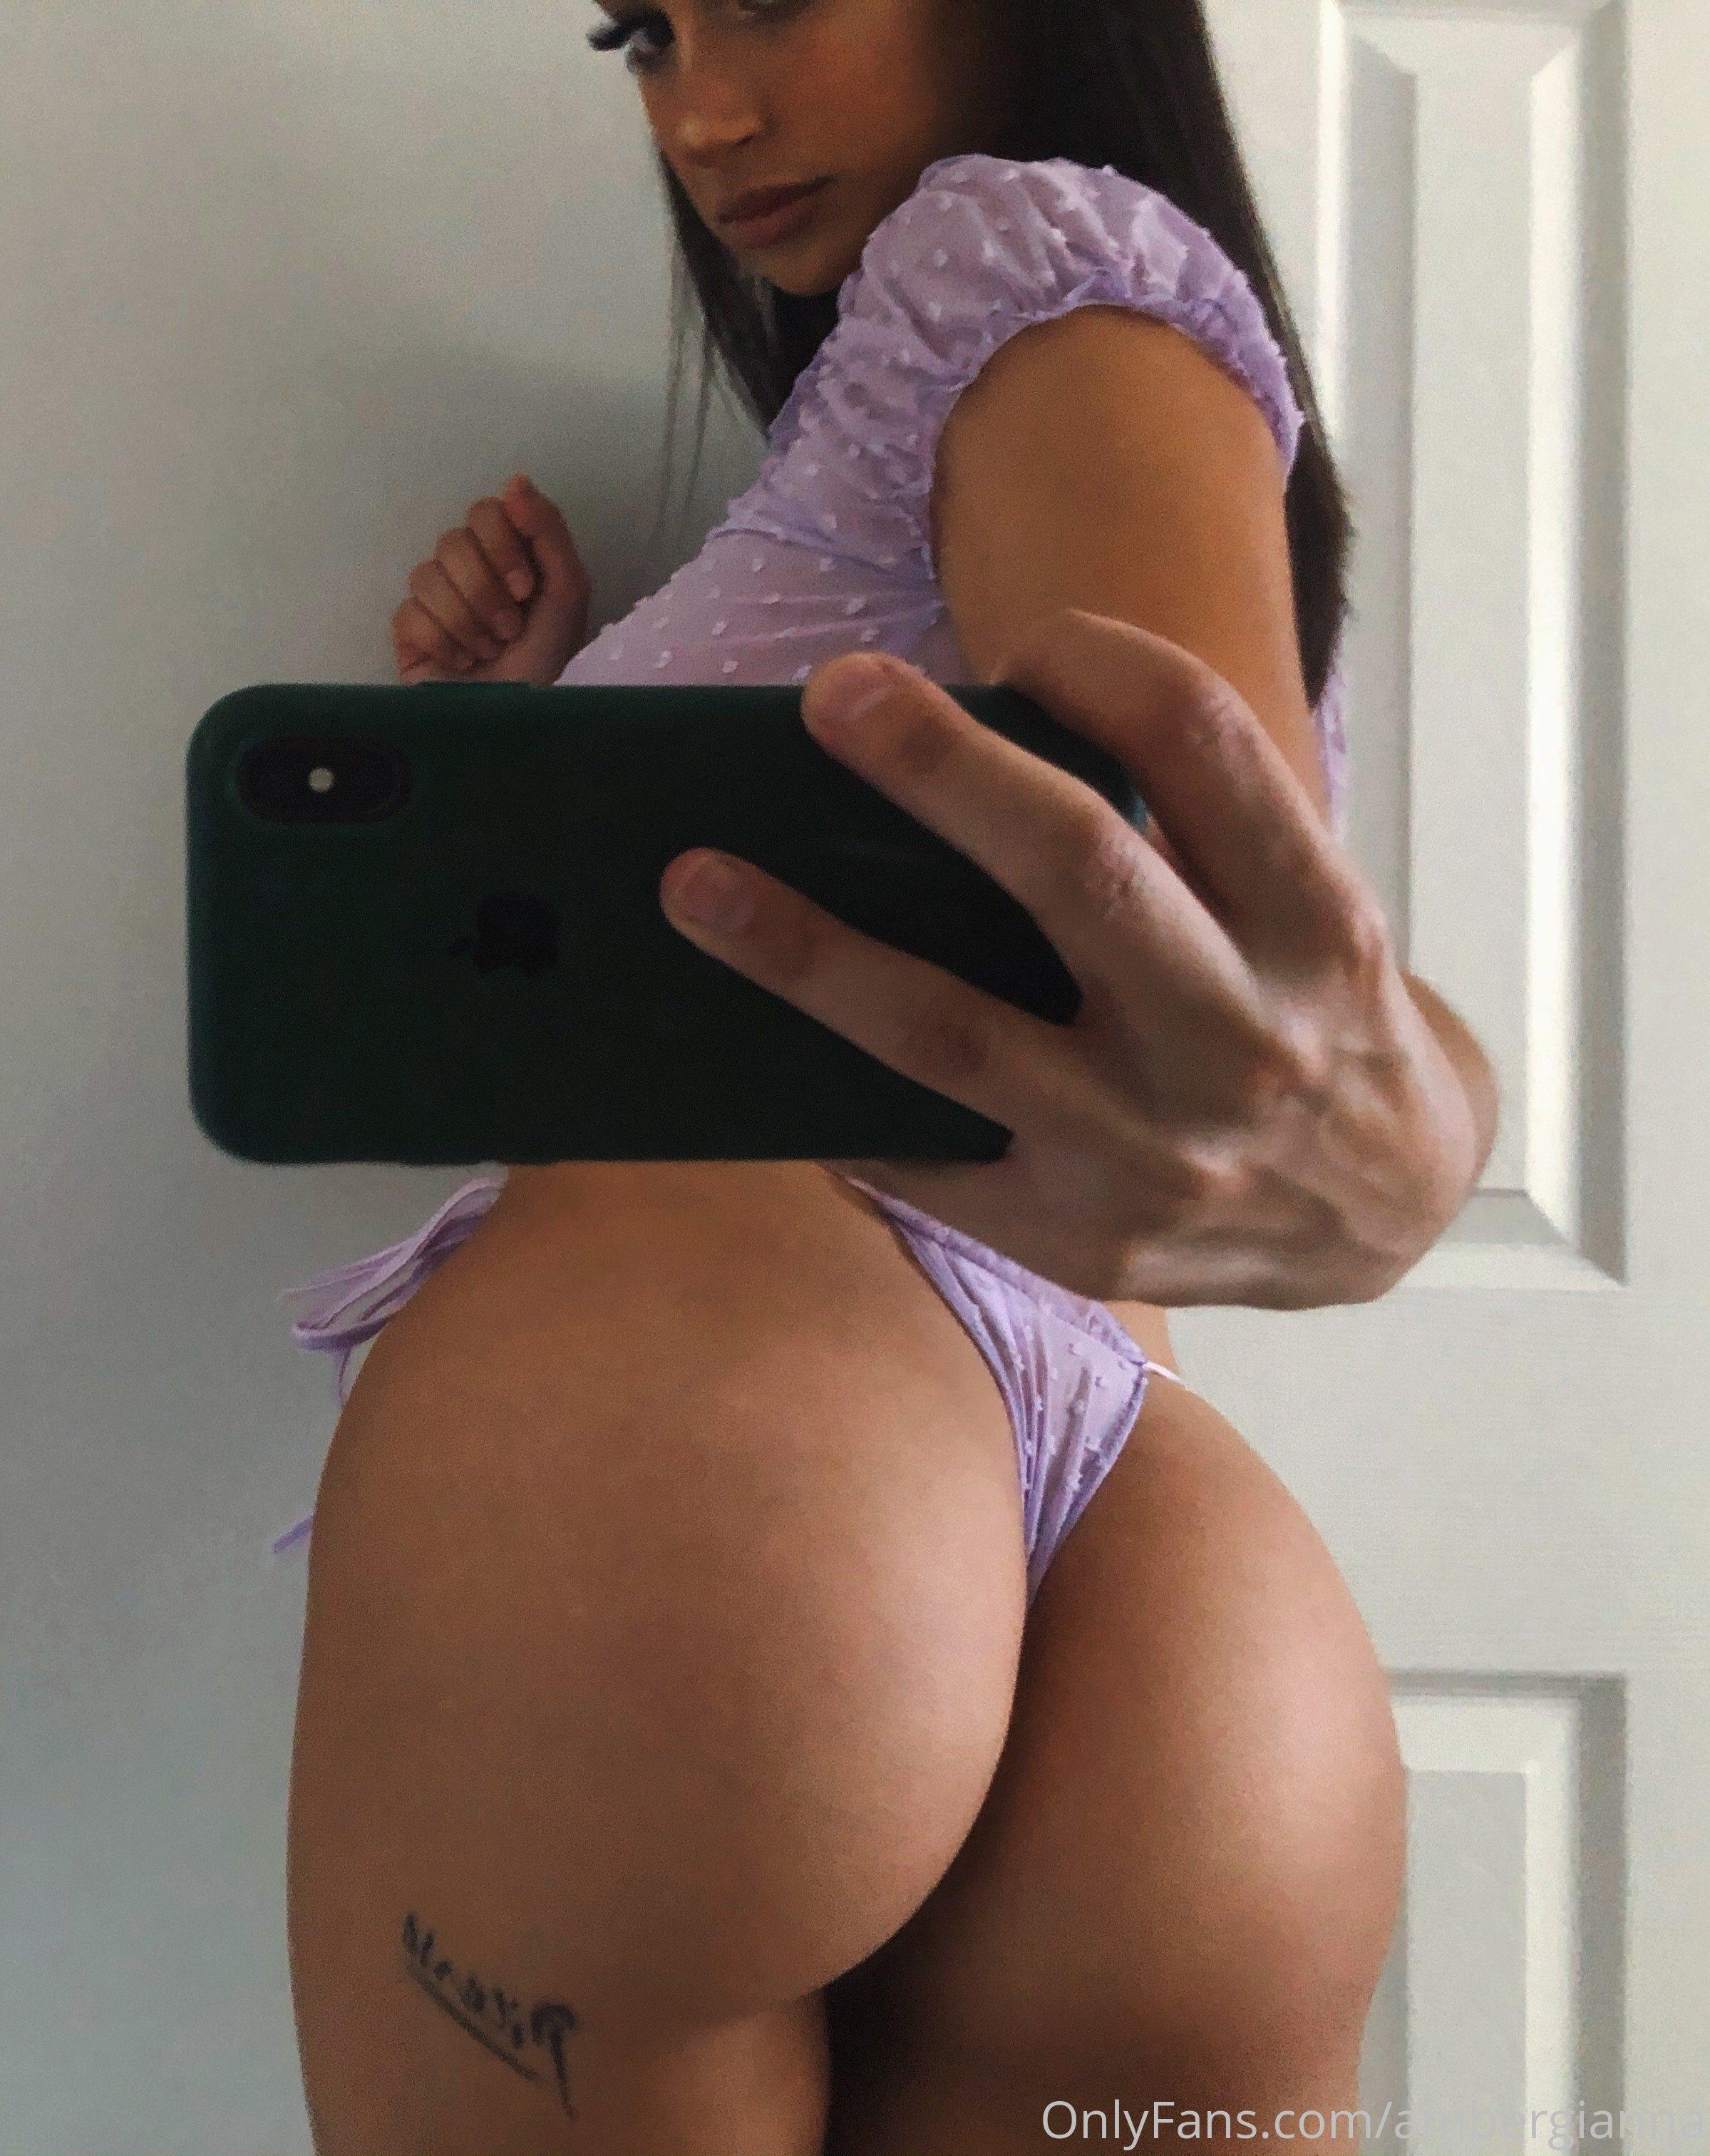 Amber Gianna Leaked 0138